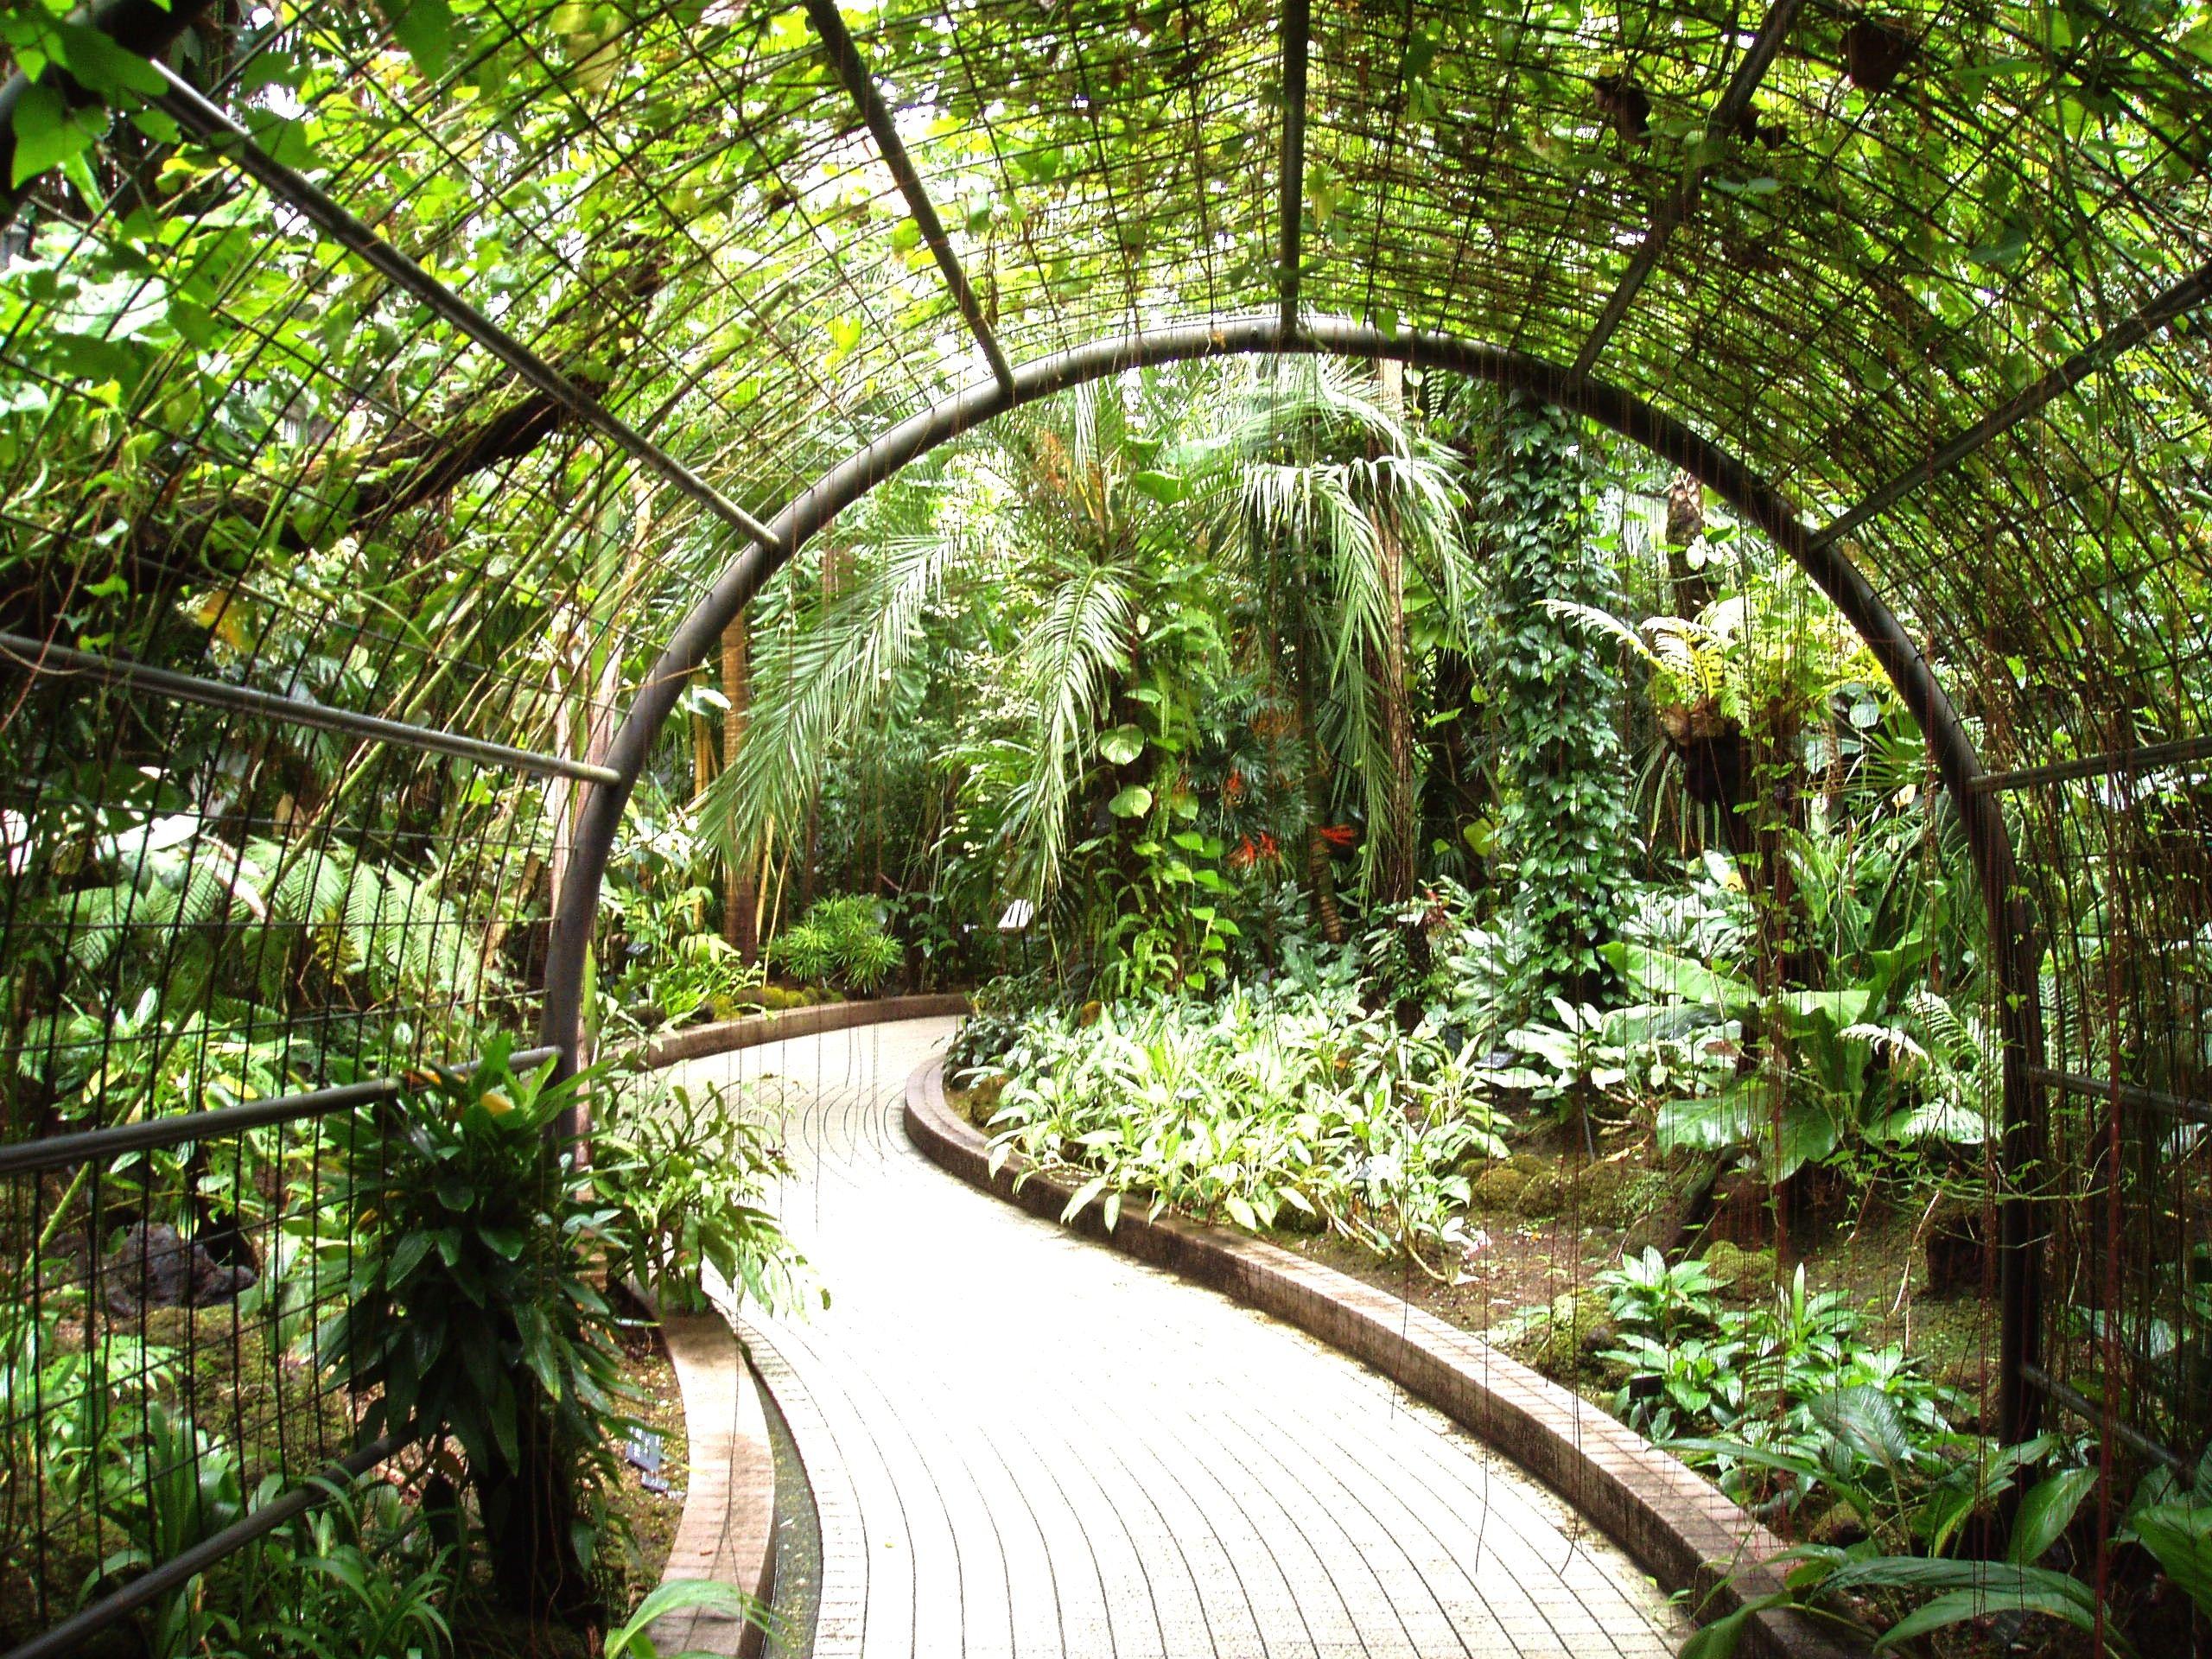 97ff5a4b6b26227ef4edd6c8f627c068 - How Big Is The Botanical Gardens